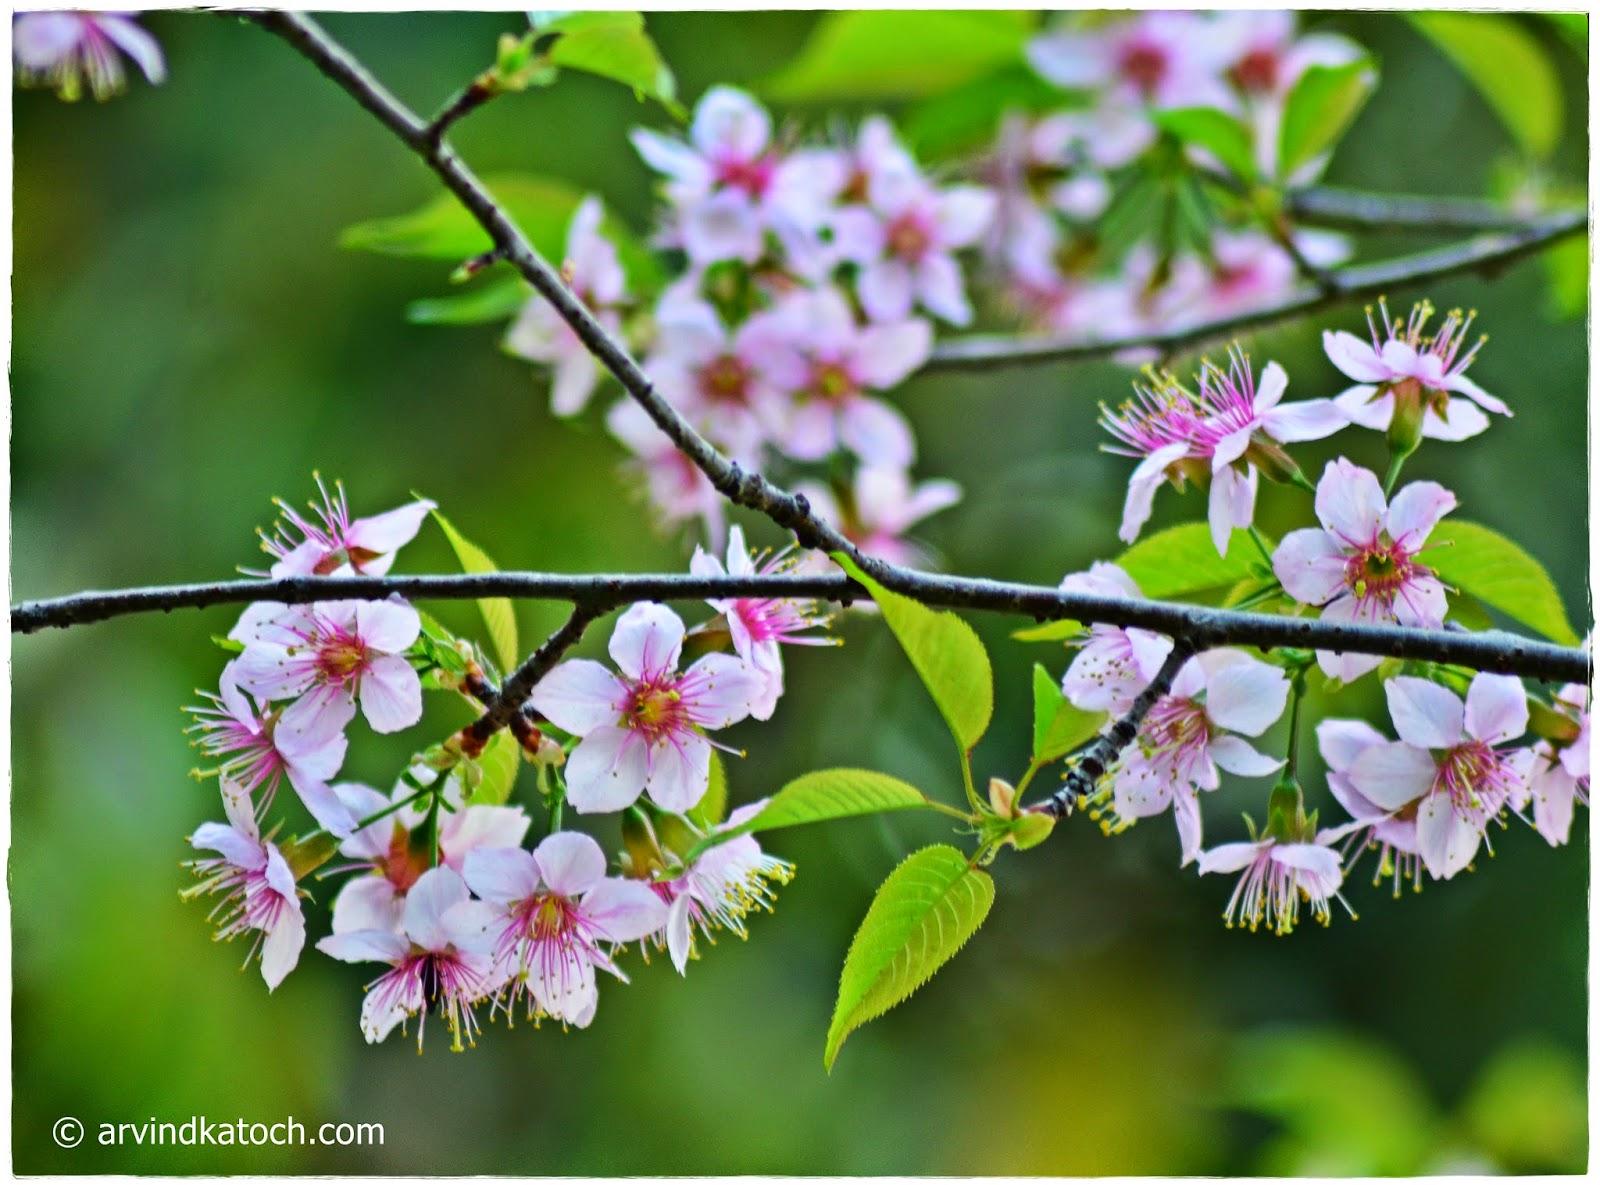 Paja Tree Flowers, Pink Flowers, Tree Flowers